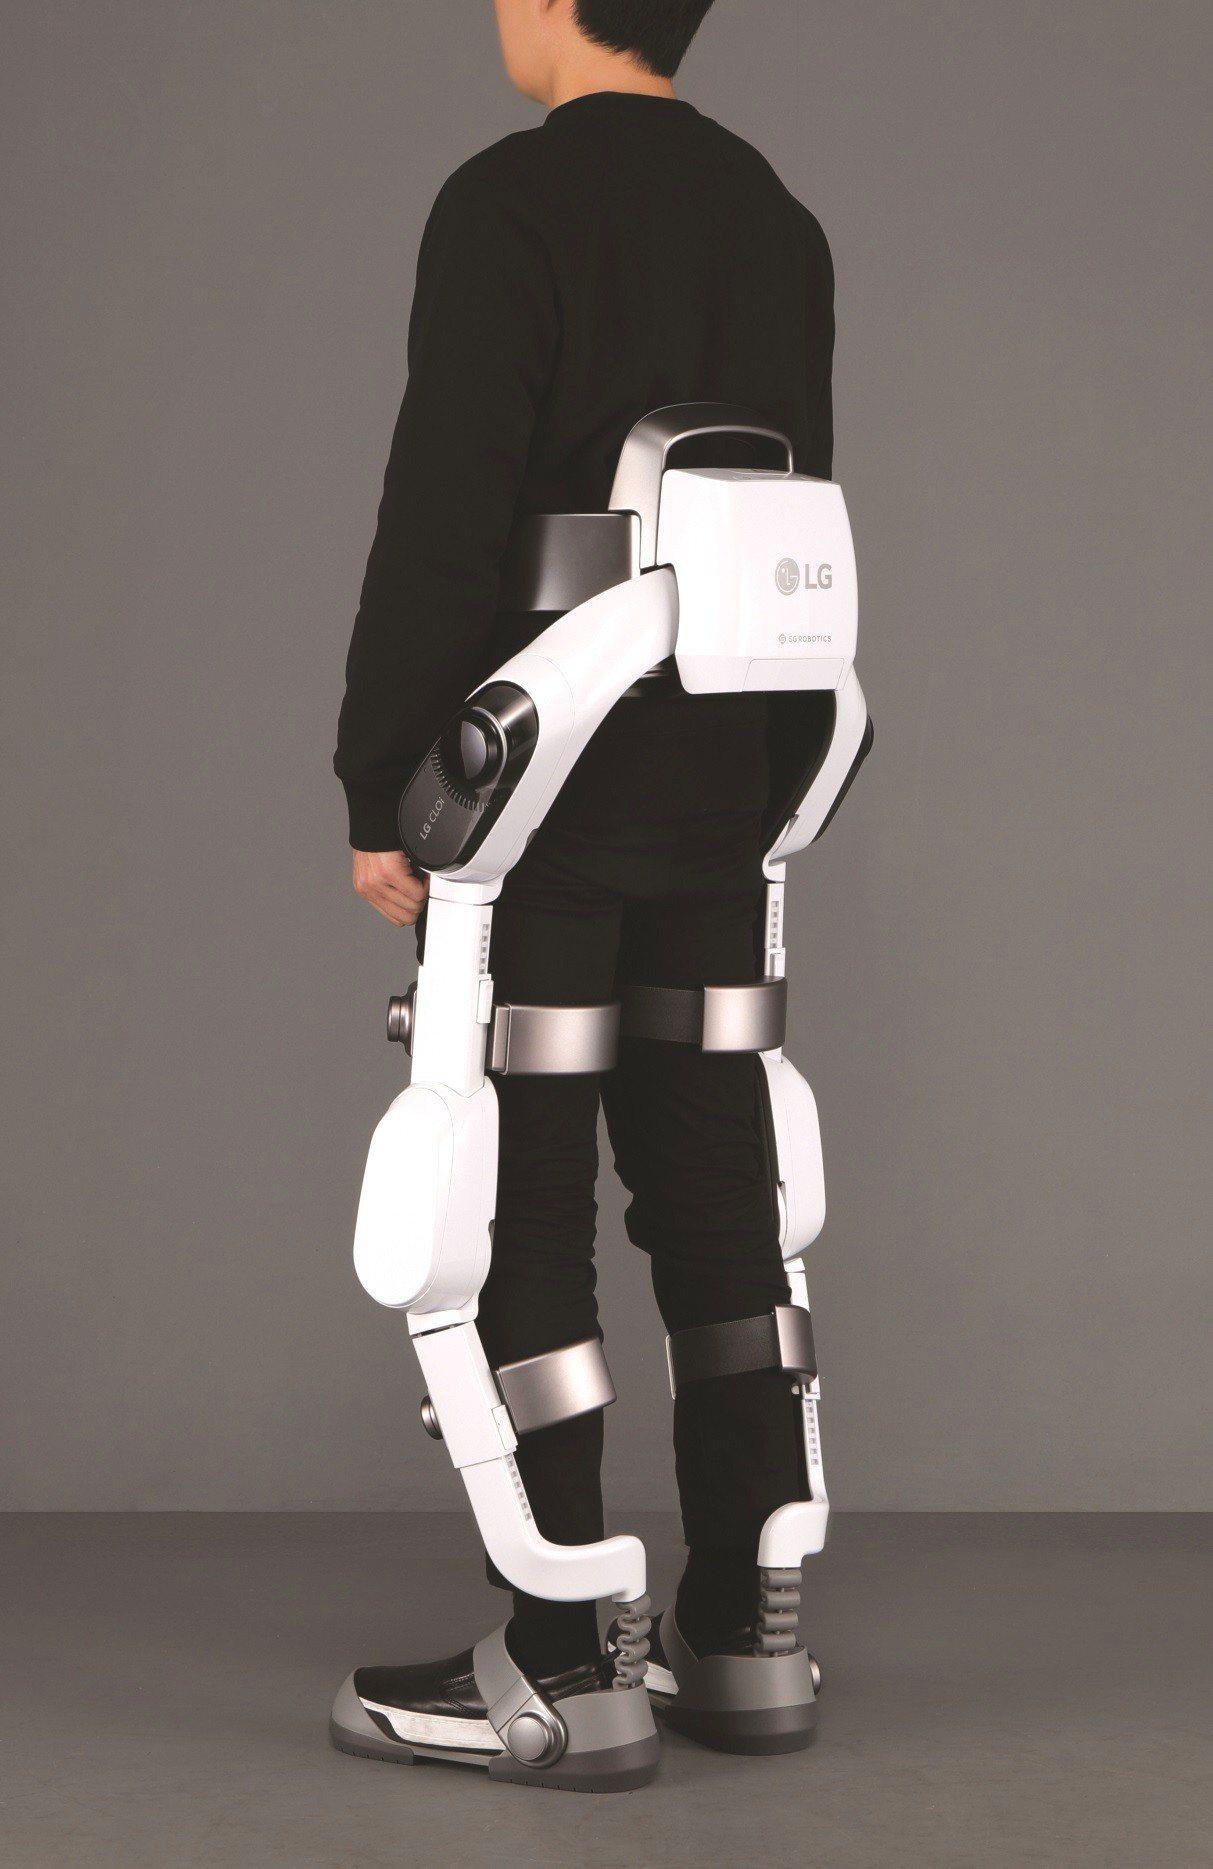 CLOi SuitBot採用舒適合身的設計與流暢的旋轉關節。圖/LG提供